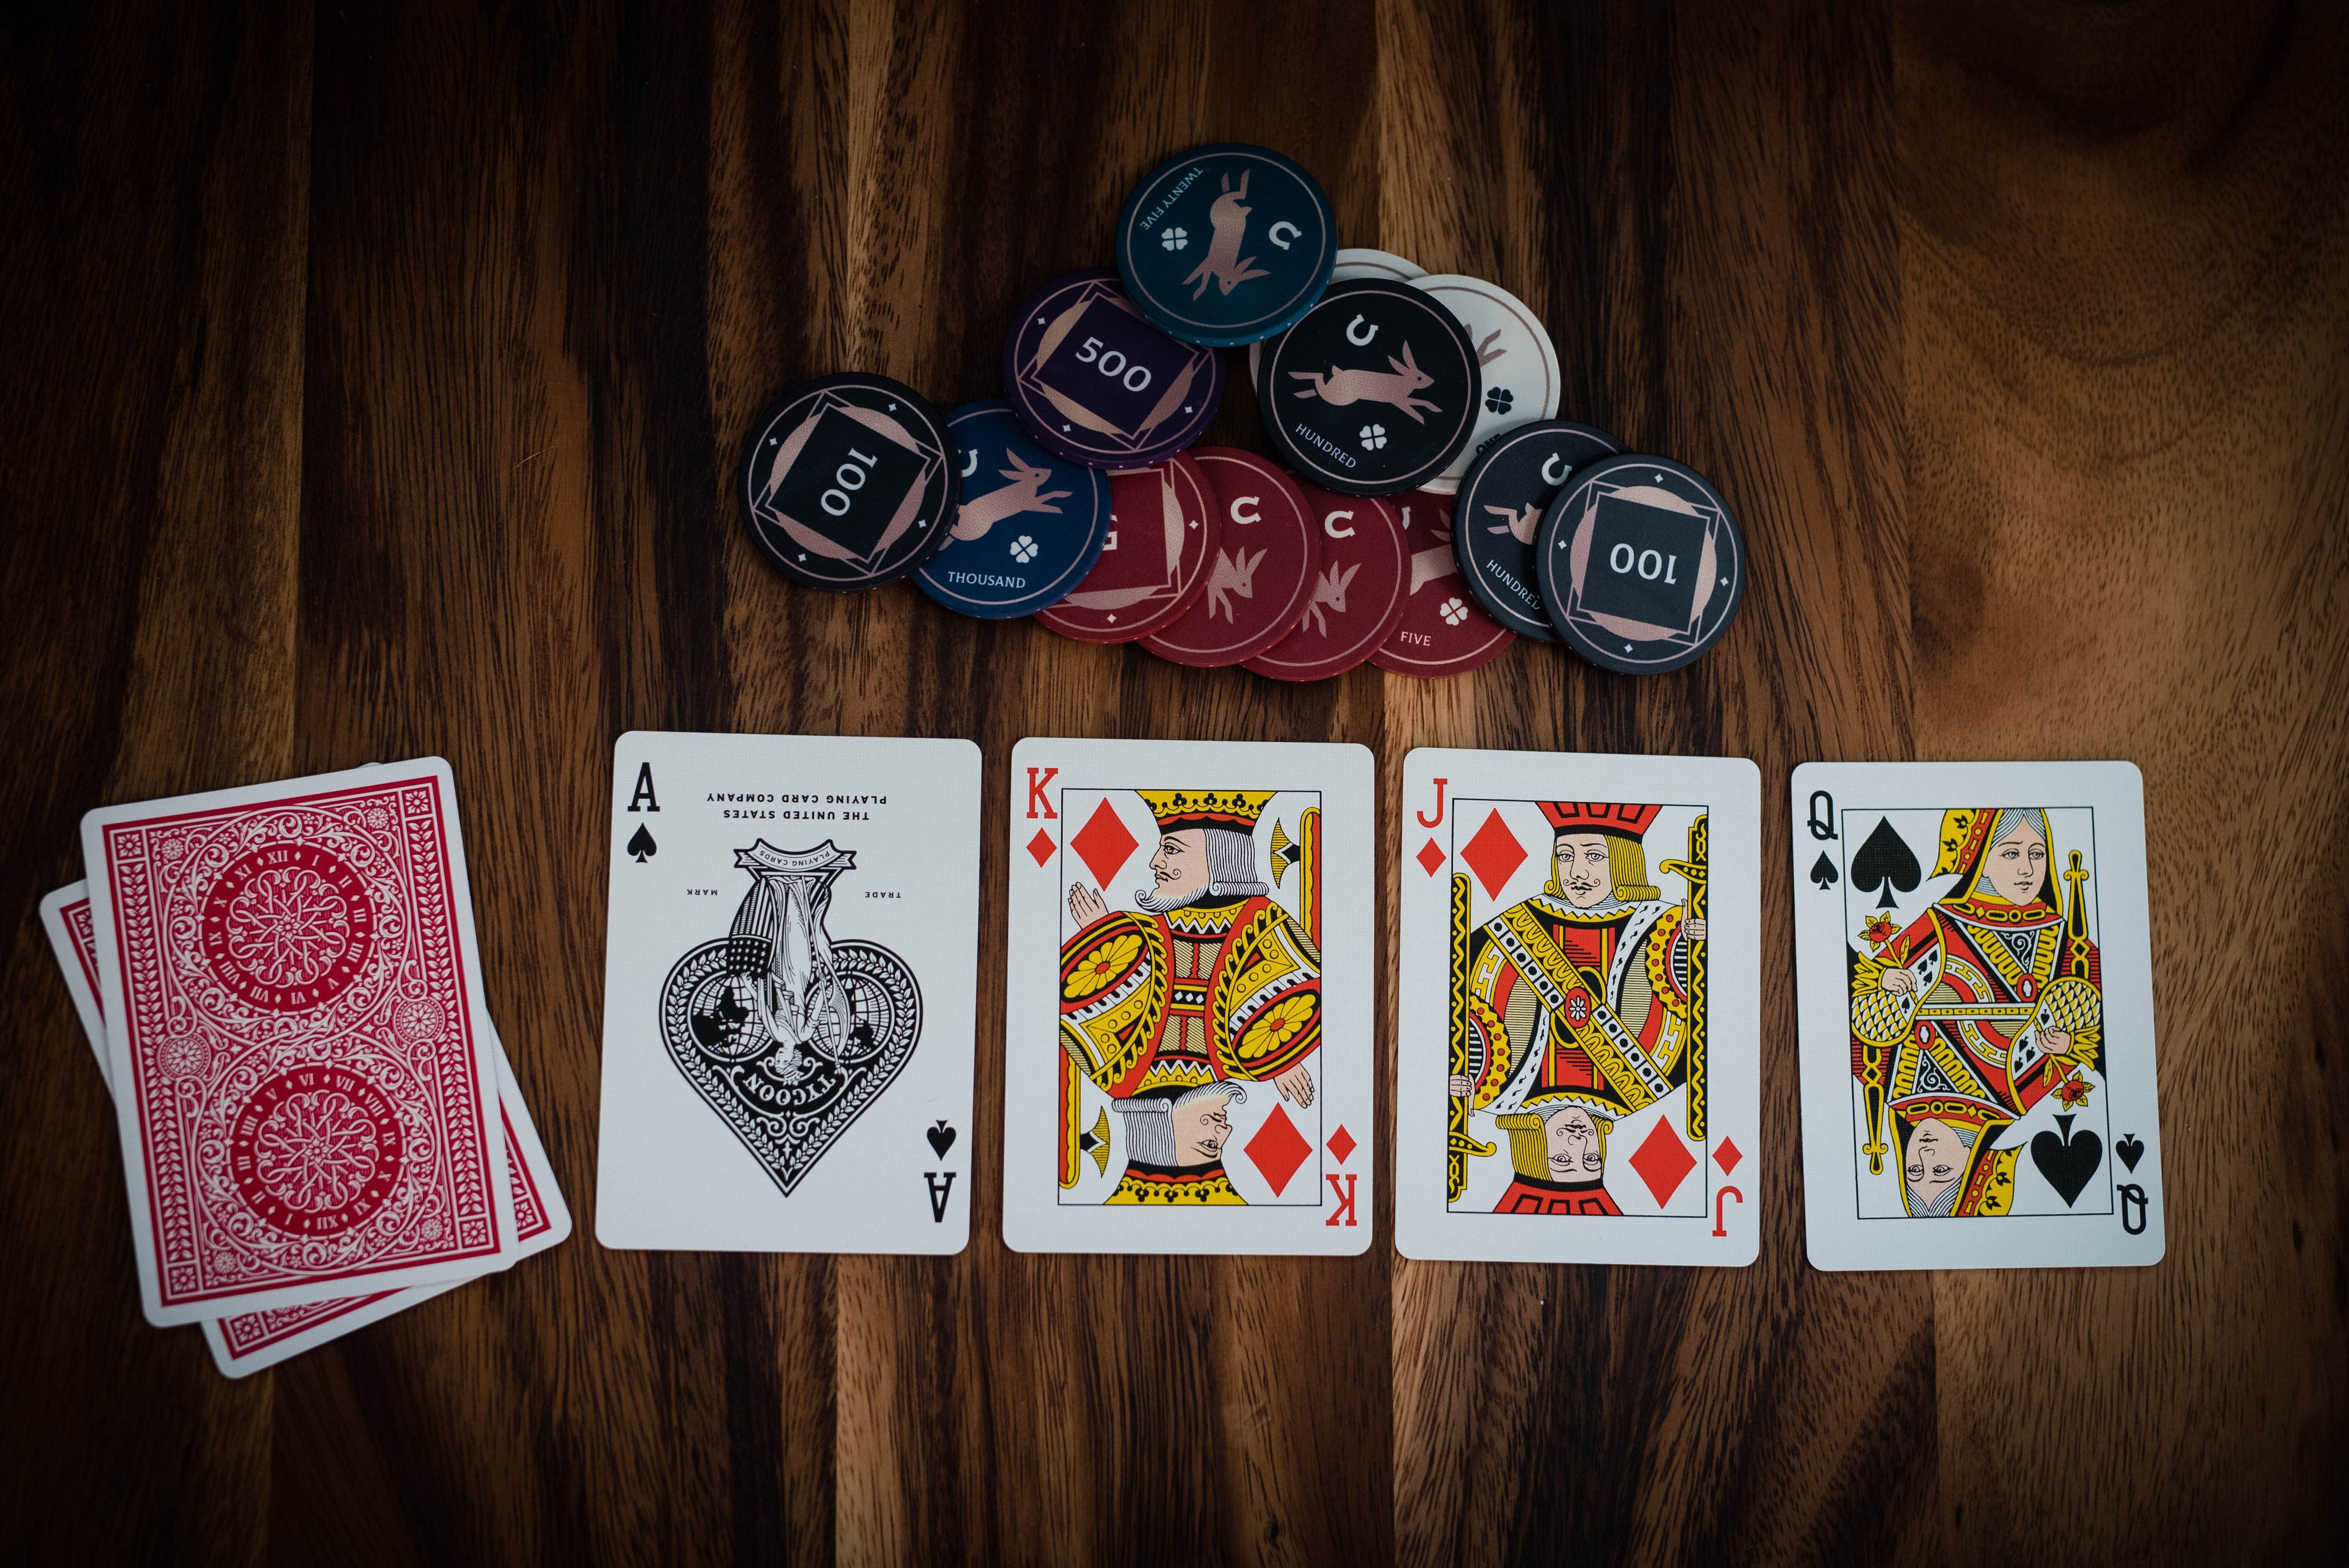 Mainkan Live Pai Gow Poker Online